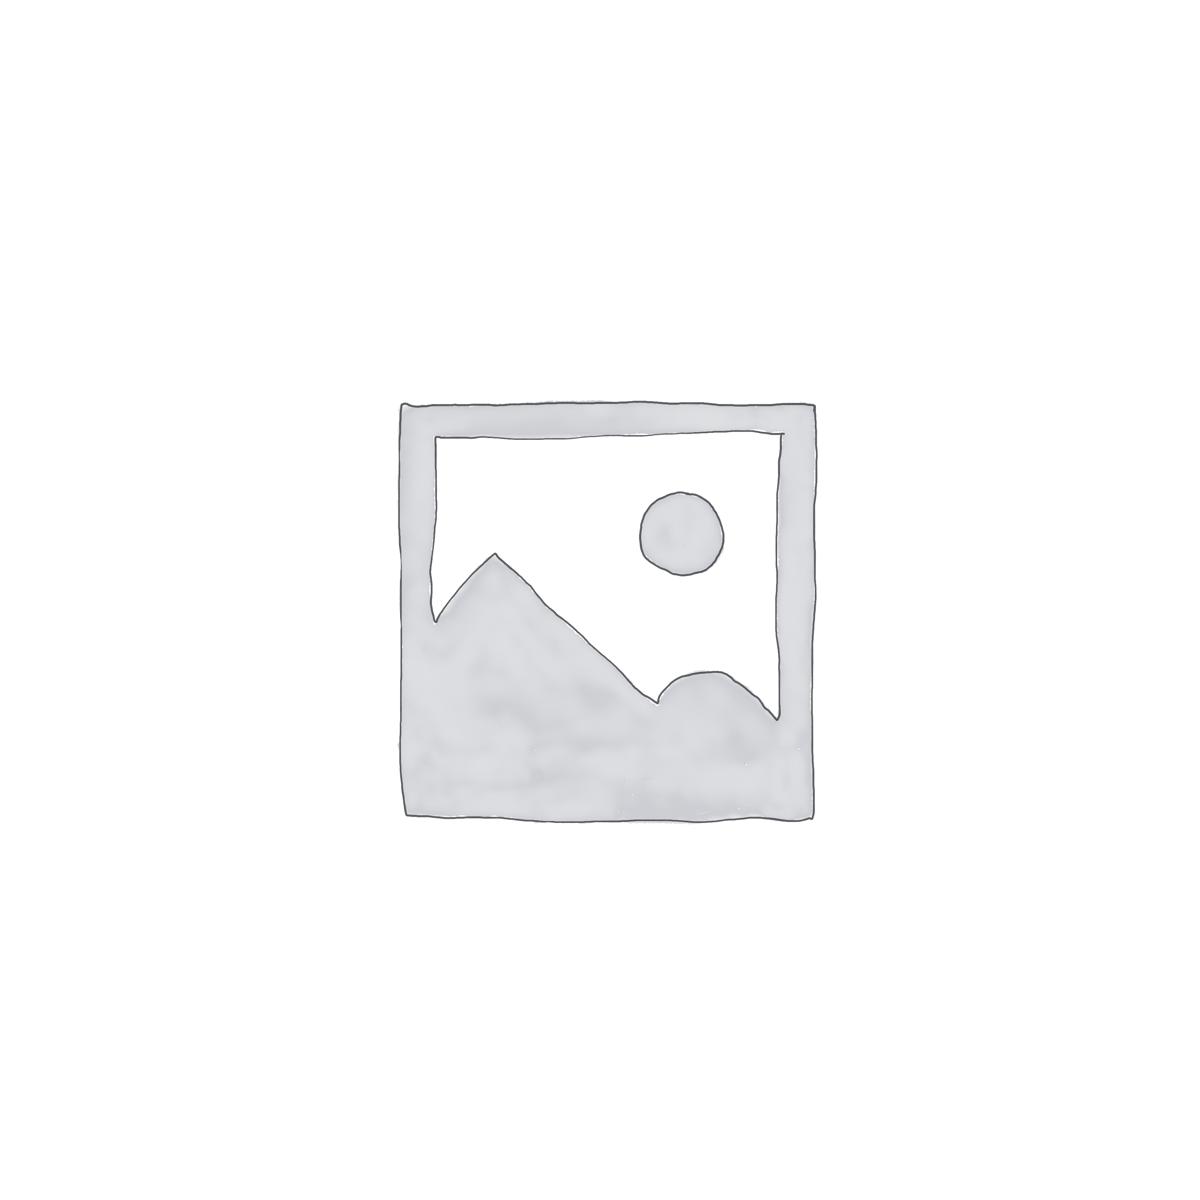 TONER Konica Minolta TN-512C do C454/C554, 26 000 stron CYAN